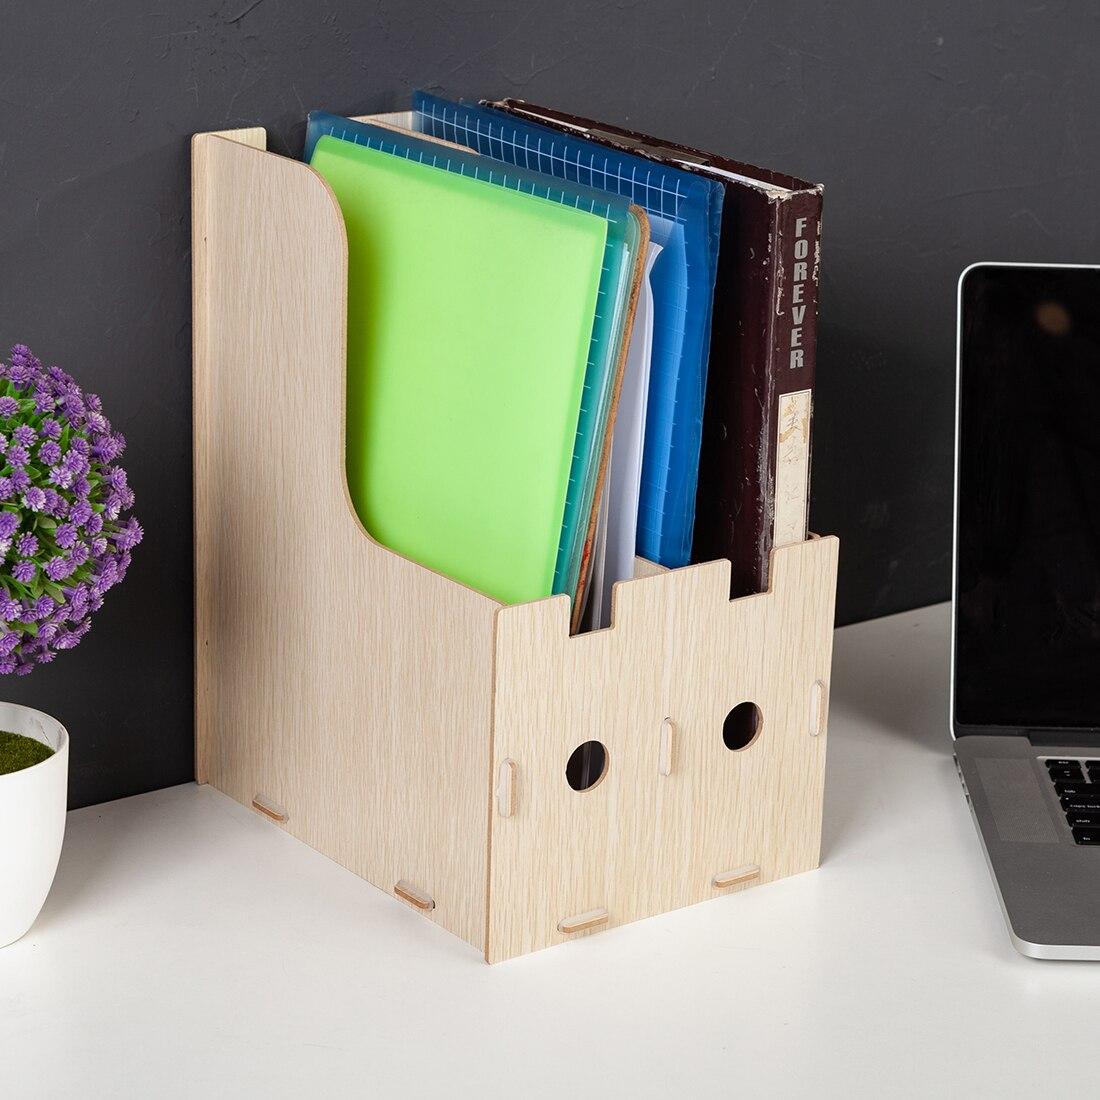 File Storage Box Office Study Desktop Organizer Shelf for Books Documents Black Oak Color Home Storage Organization